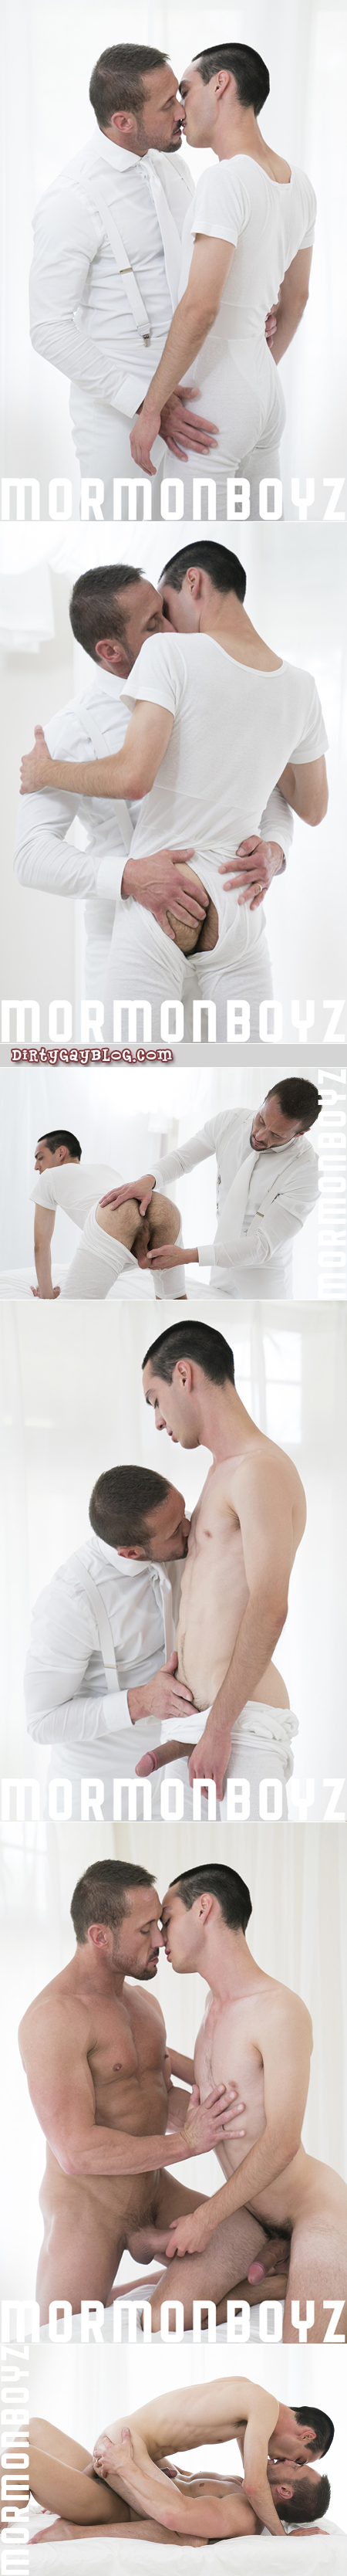 Mormon President fucks his well-hung Elder bareback as initiation.